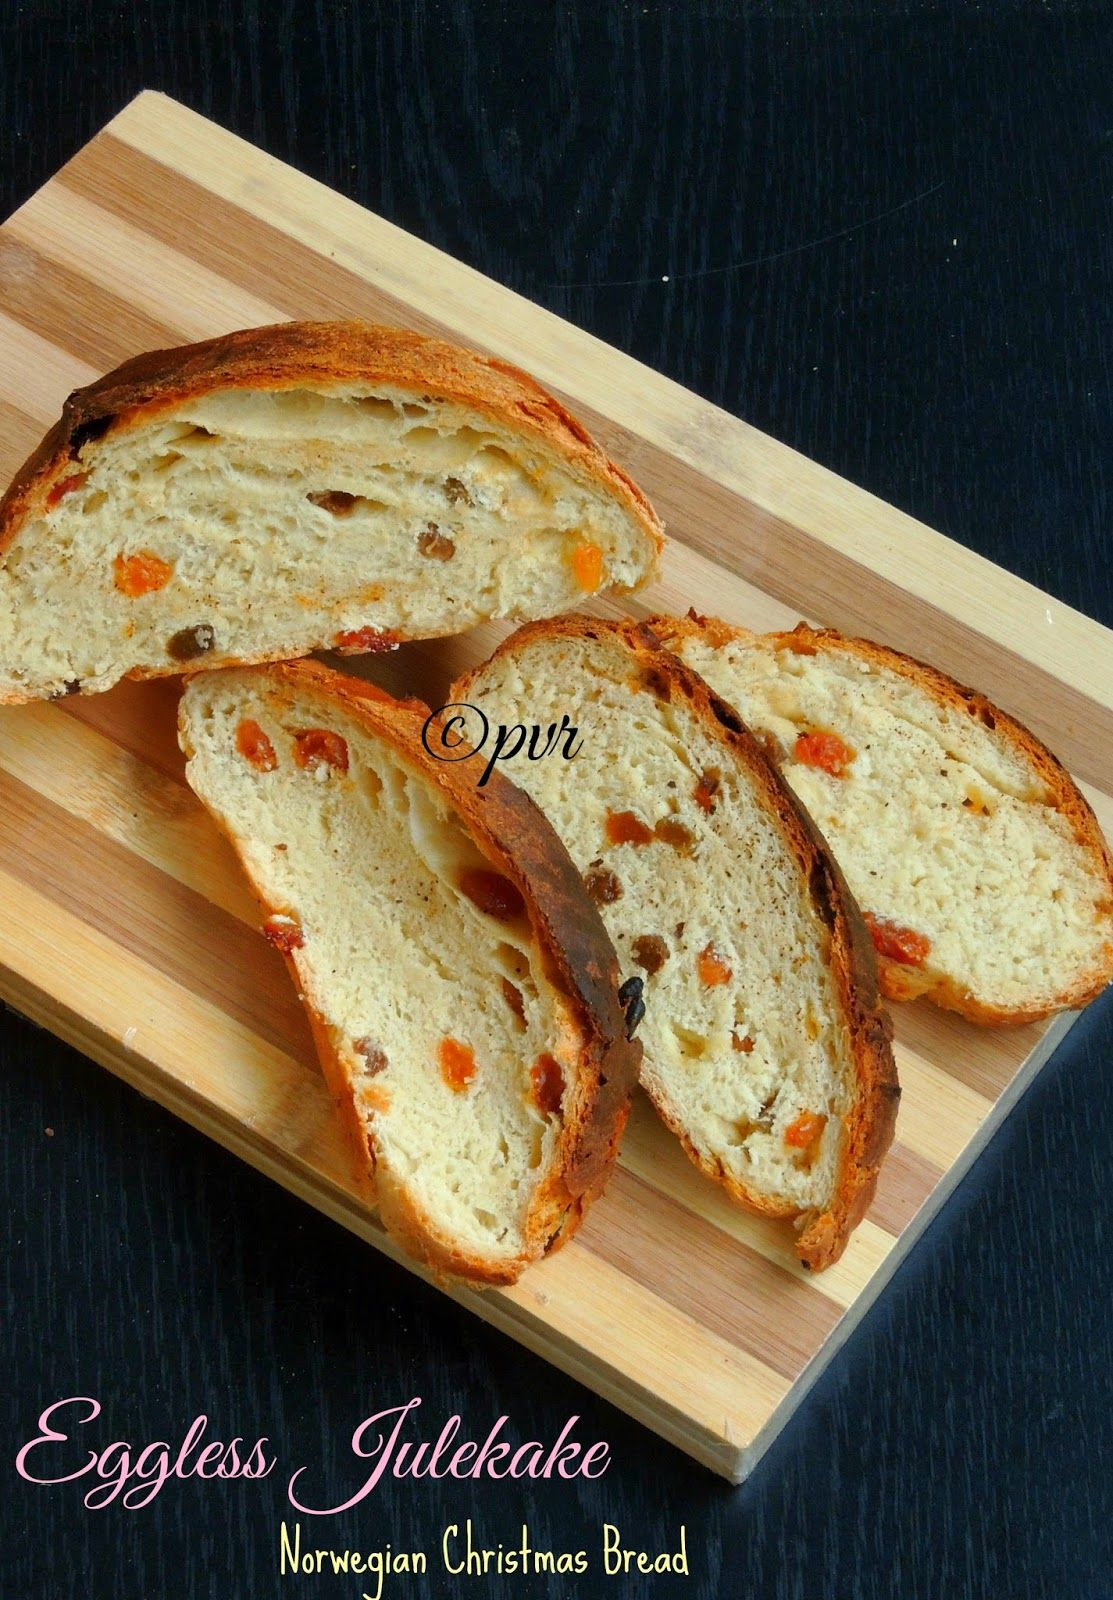 Eggless Julekake - Norwegian Christmas Bread | Food | Pinterest ...